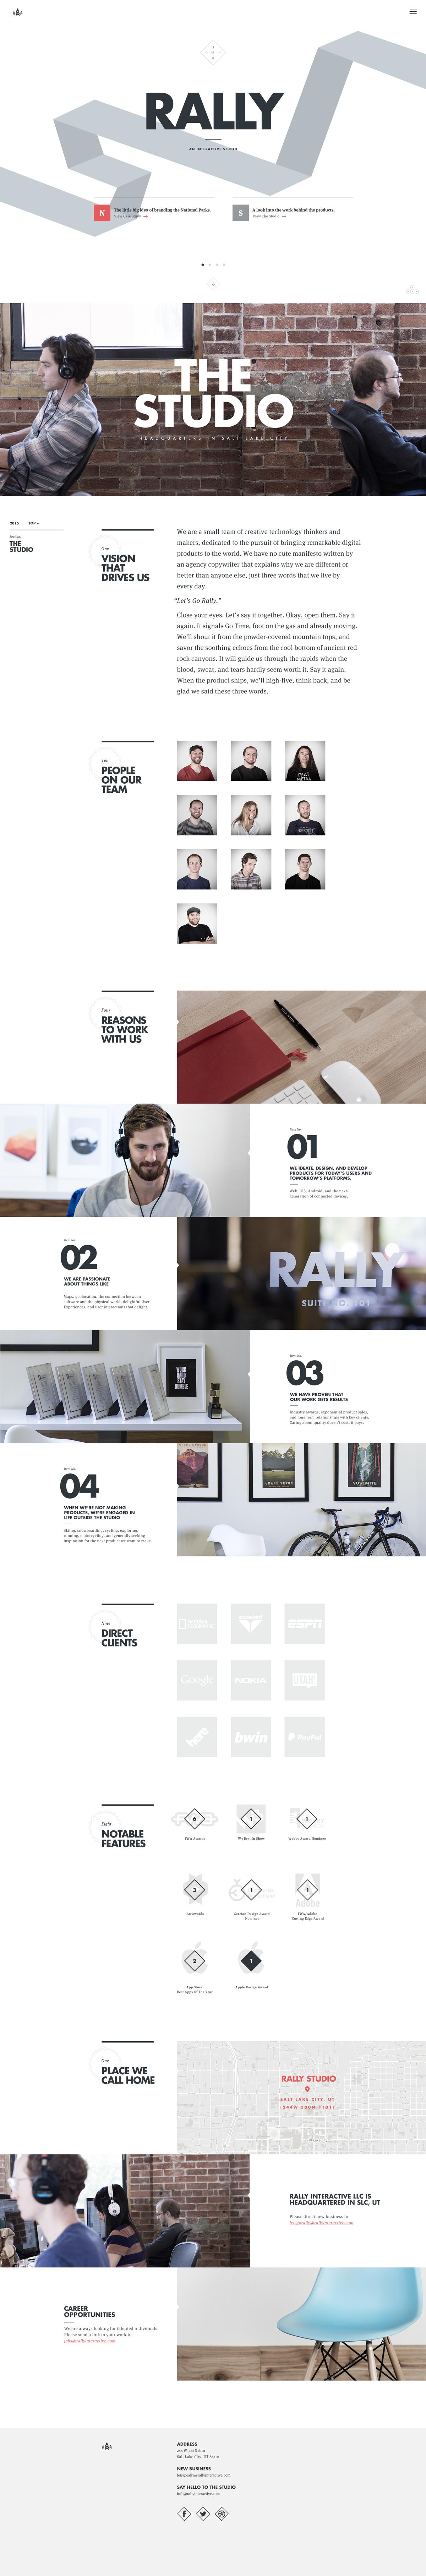 The Studio Page | Ben Mingo | Rally Interactive | dribbble